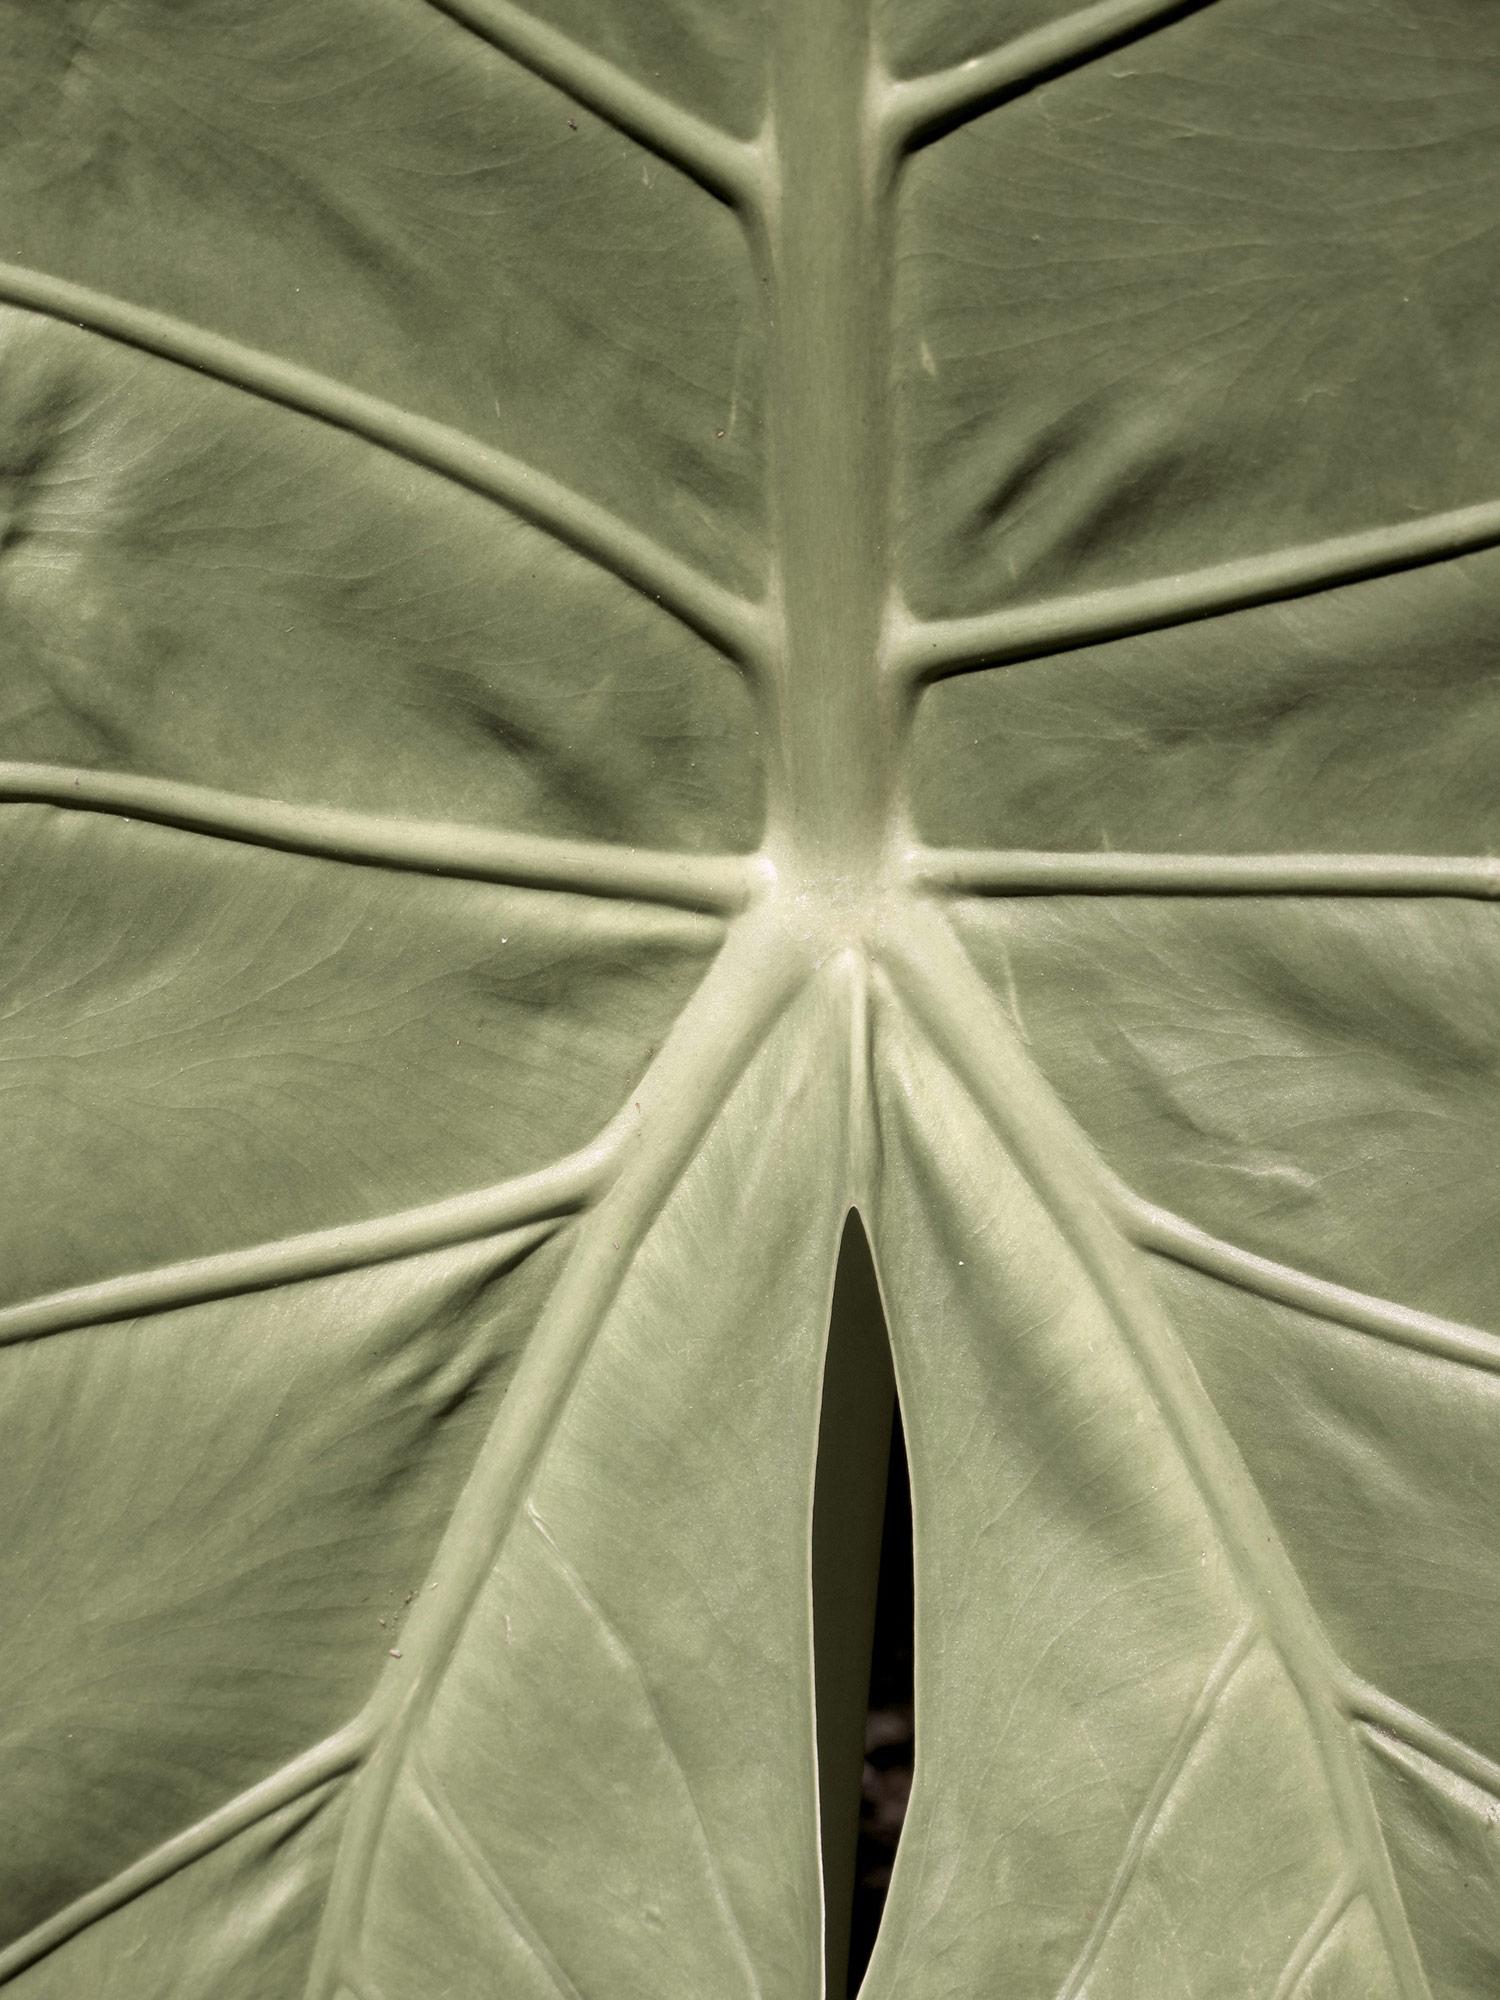 Alocasia-macrorhiza-8-